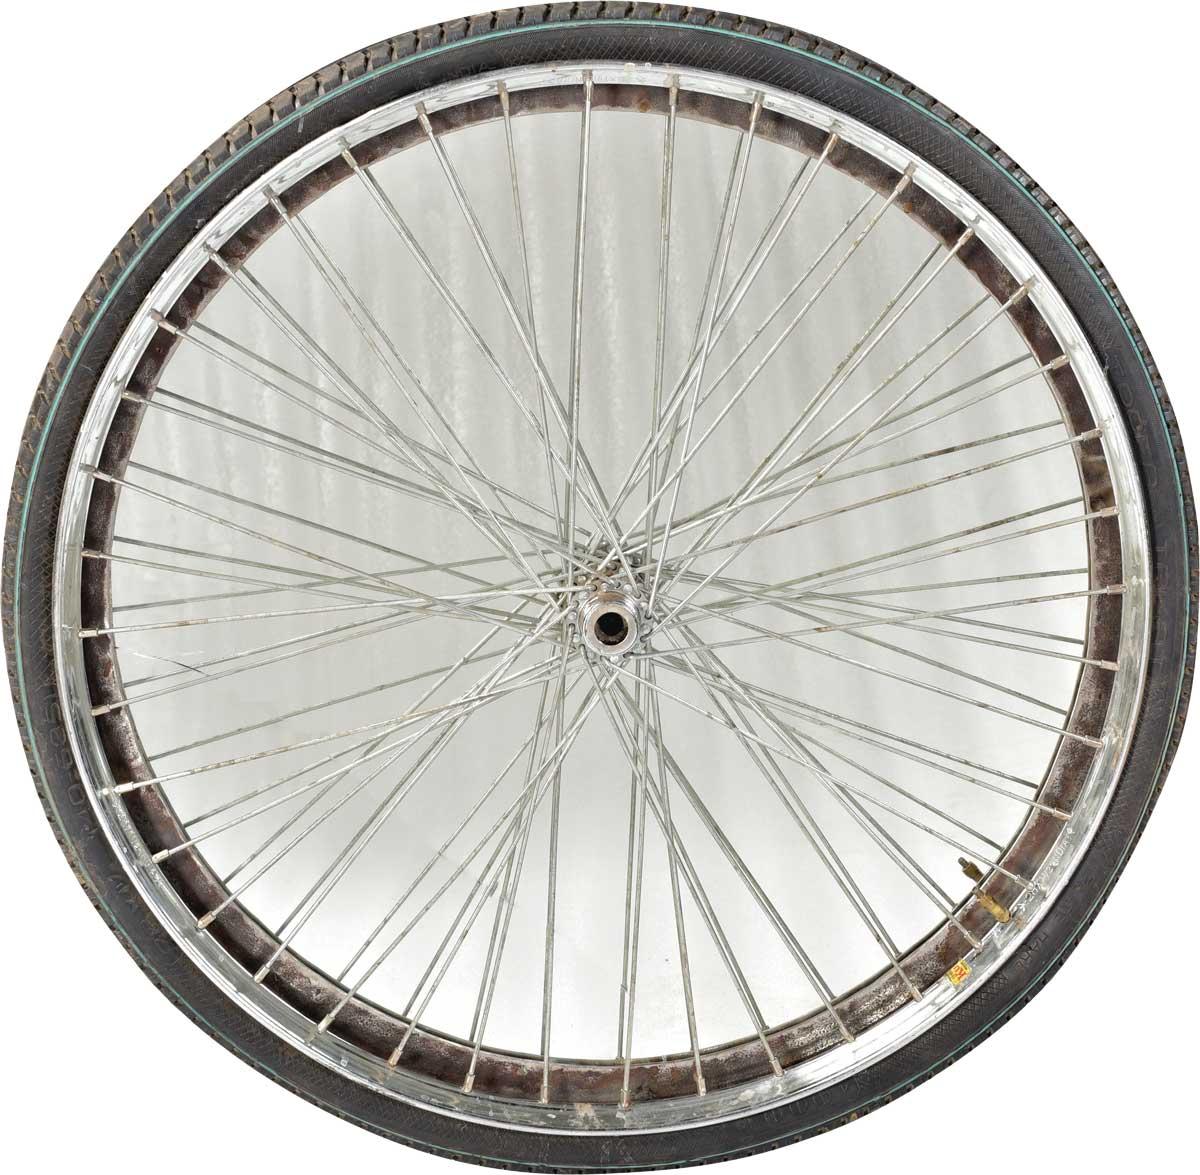 TRADEMARK LIVING Rundt spejl med gammel råt cykeldæk som ramme